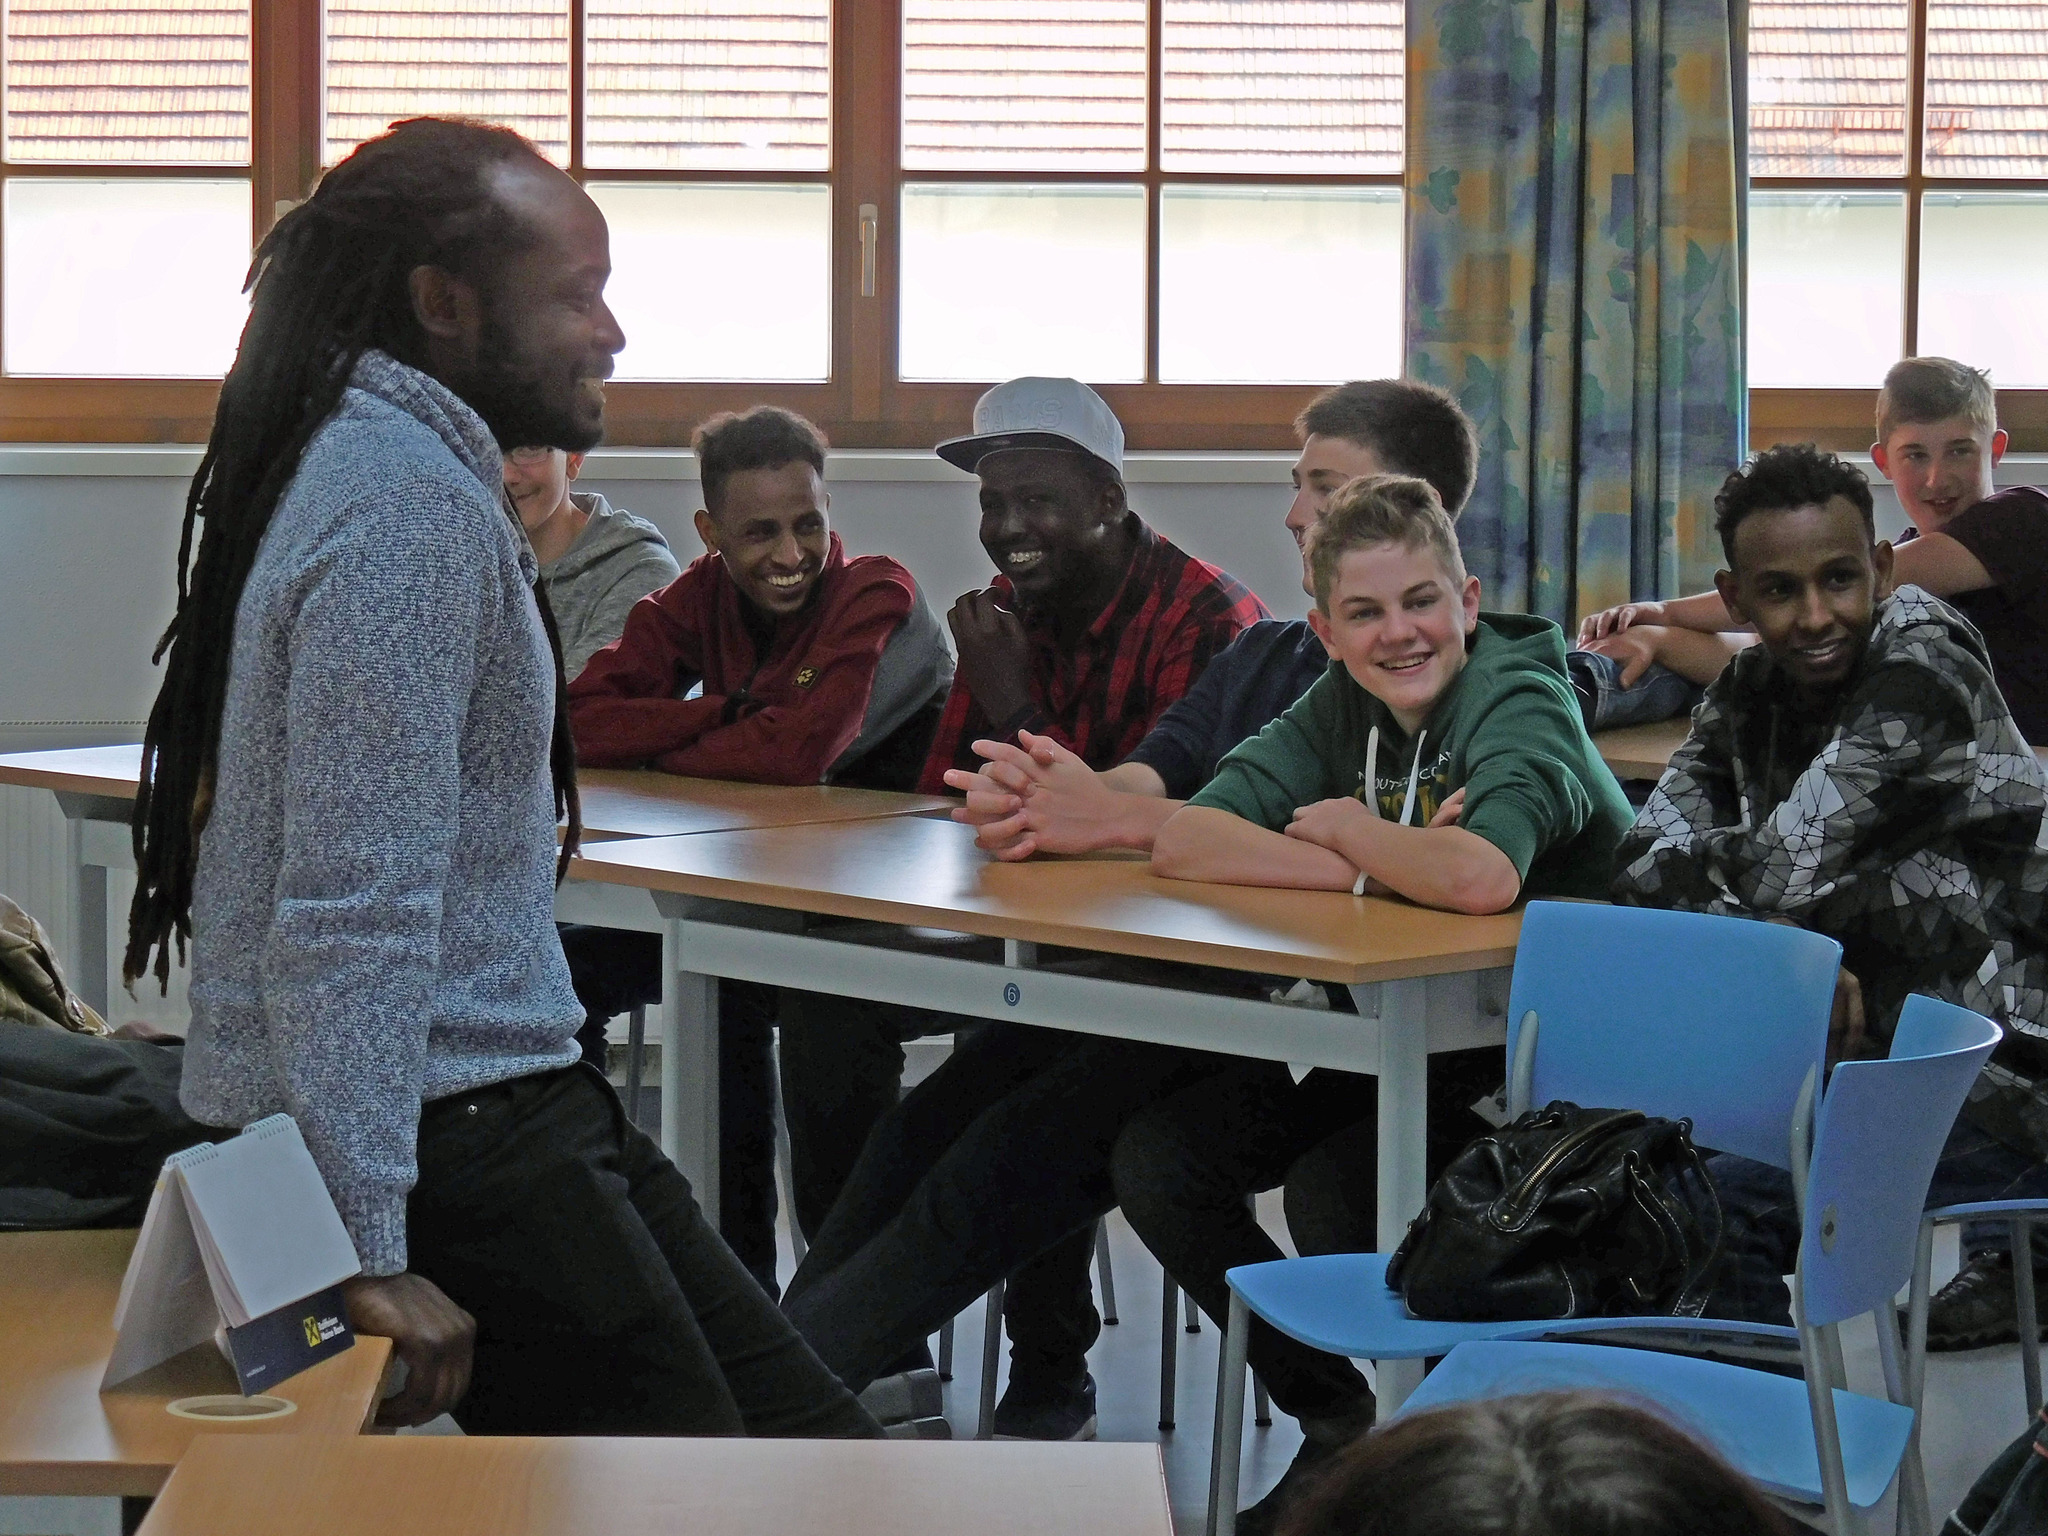 Haslach an der mhl treffen frauen Studenten singles